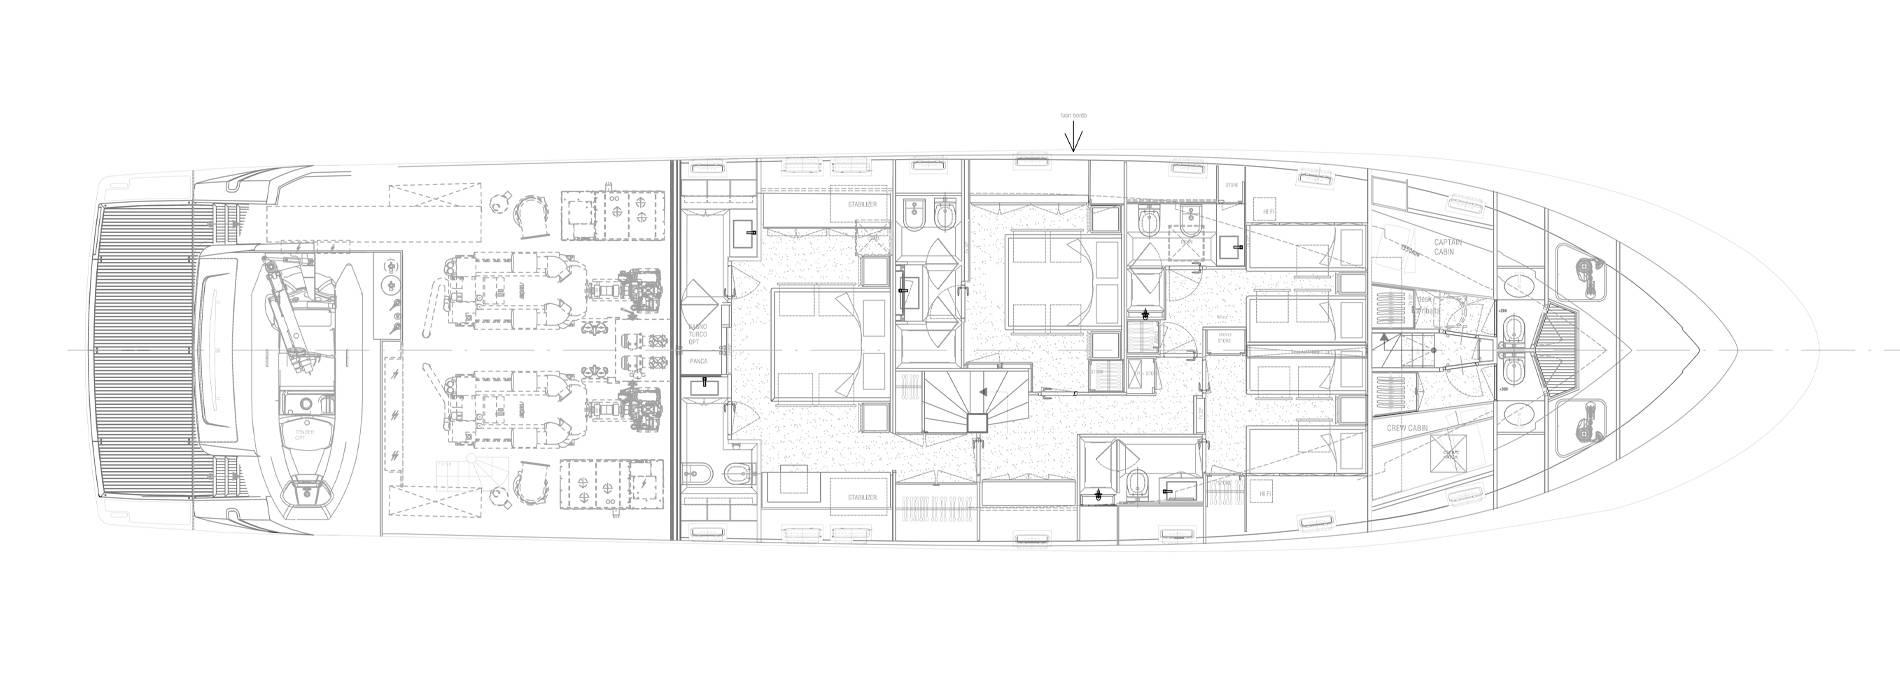 Sanlorenzo Yachts SL96-631 under offer Нижняя палуба